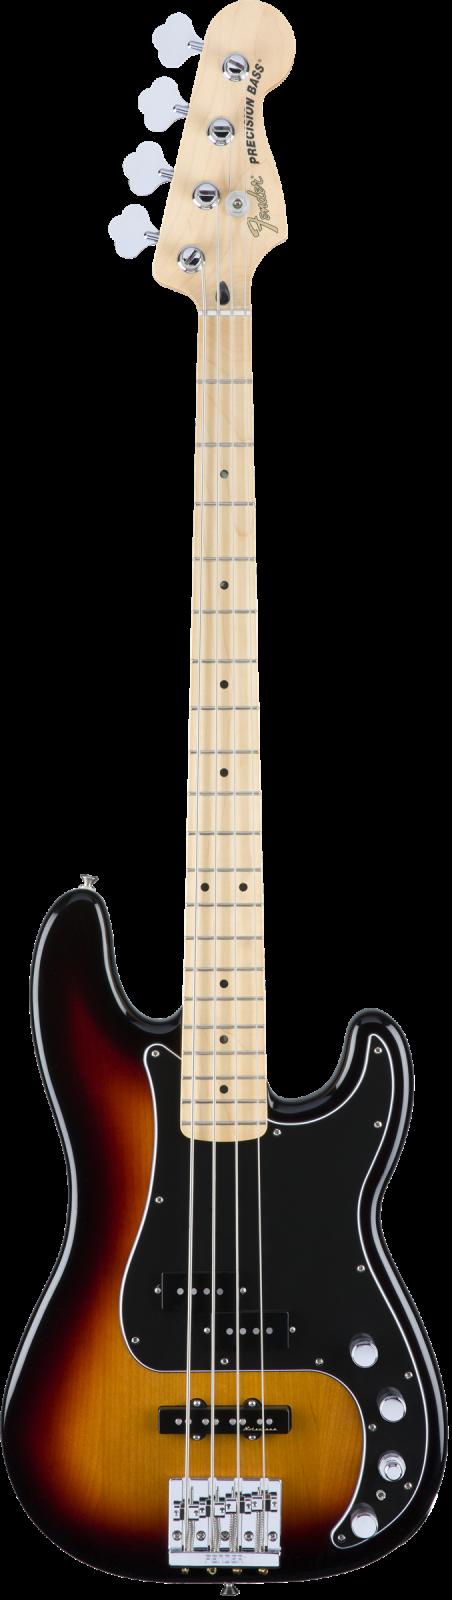 Fender Deluxe Active Precision Bass Special - Maple Fingerboard, 3-Color Sunburst